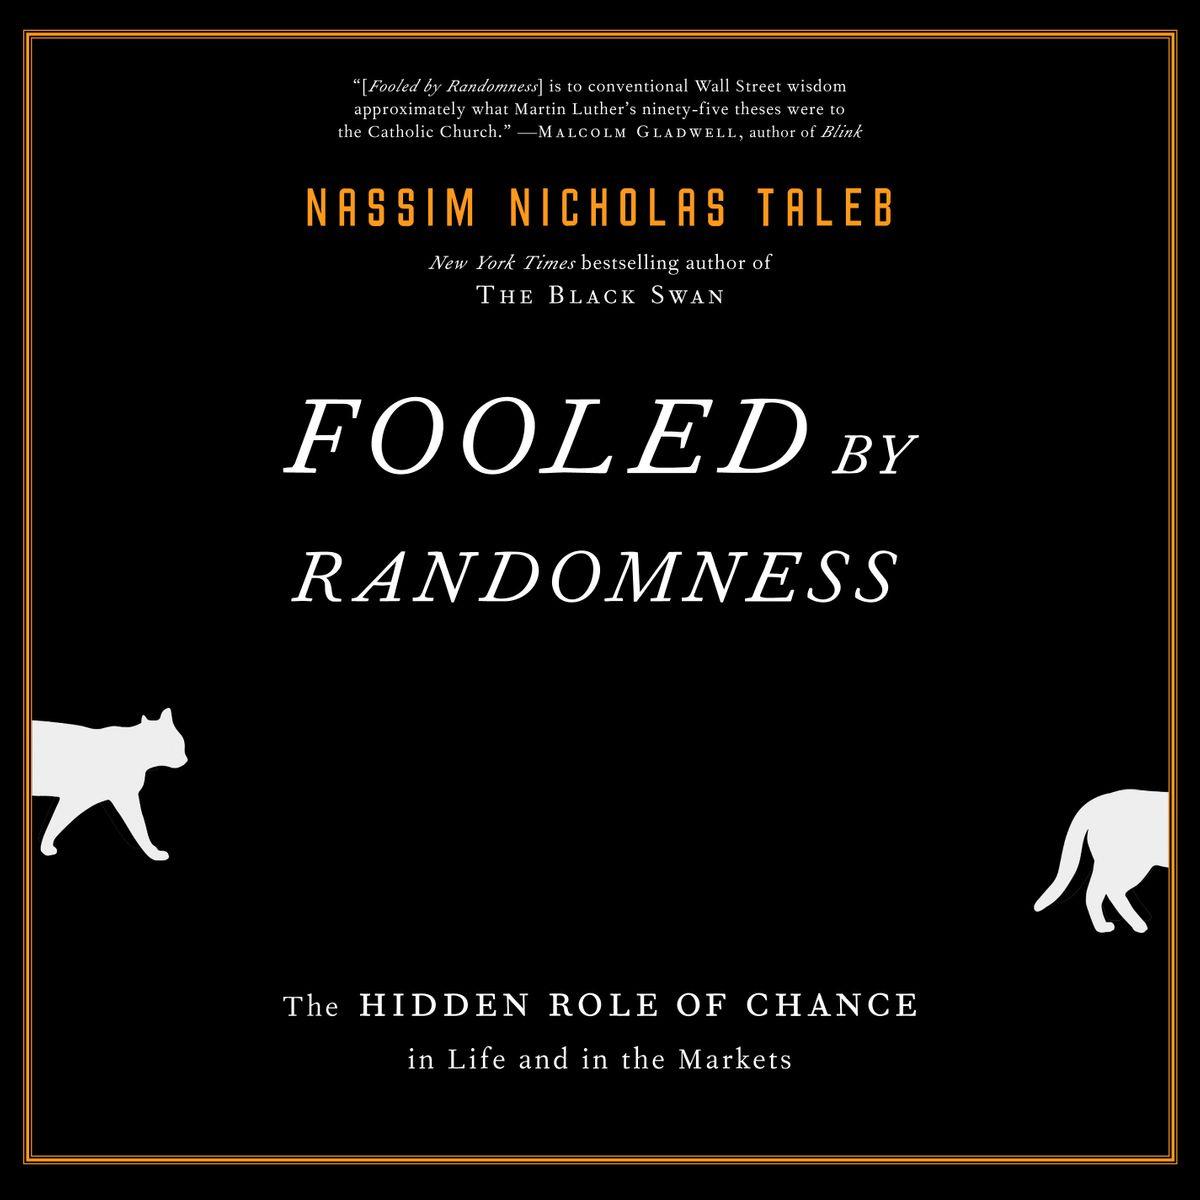 Fooled by Randomness Audiobook by Nassim Nicholas Taleb - 9781984841605 |  Rakuten Kobo United States